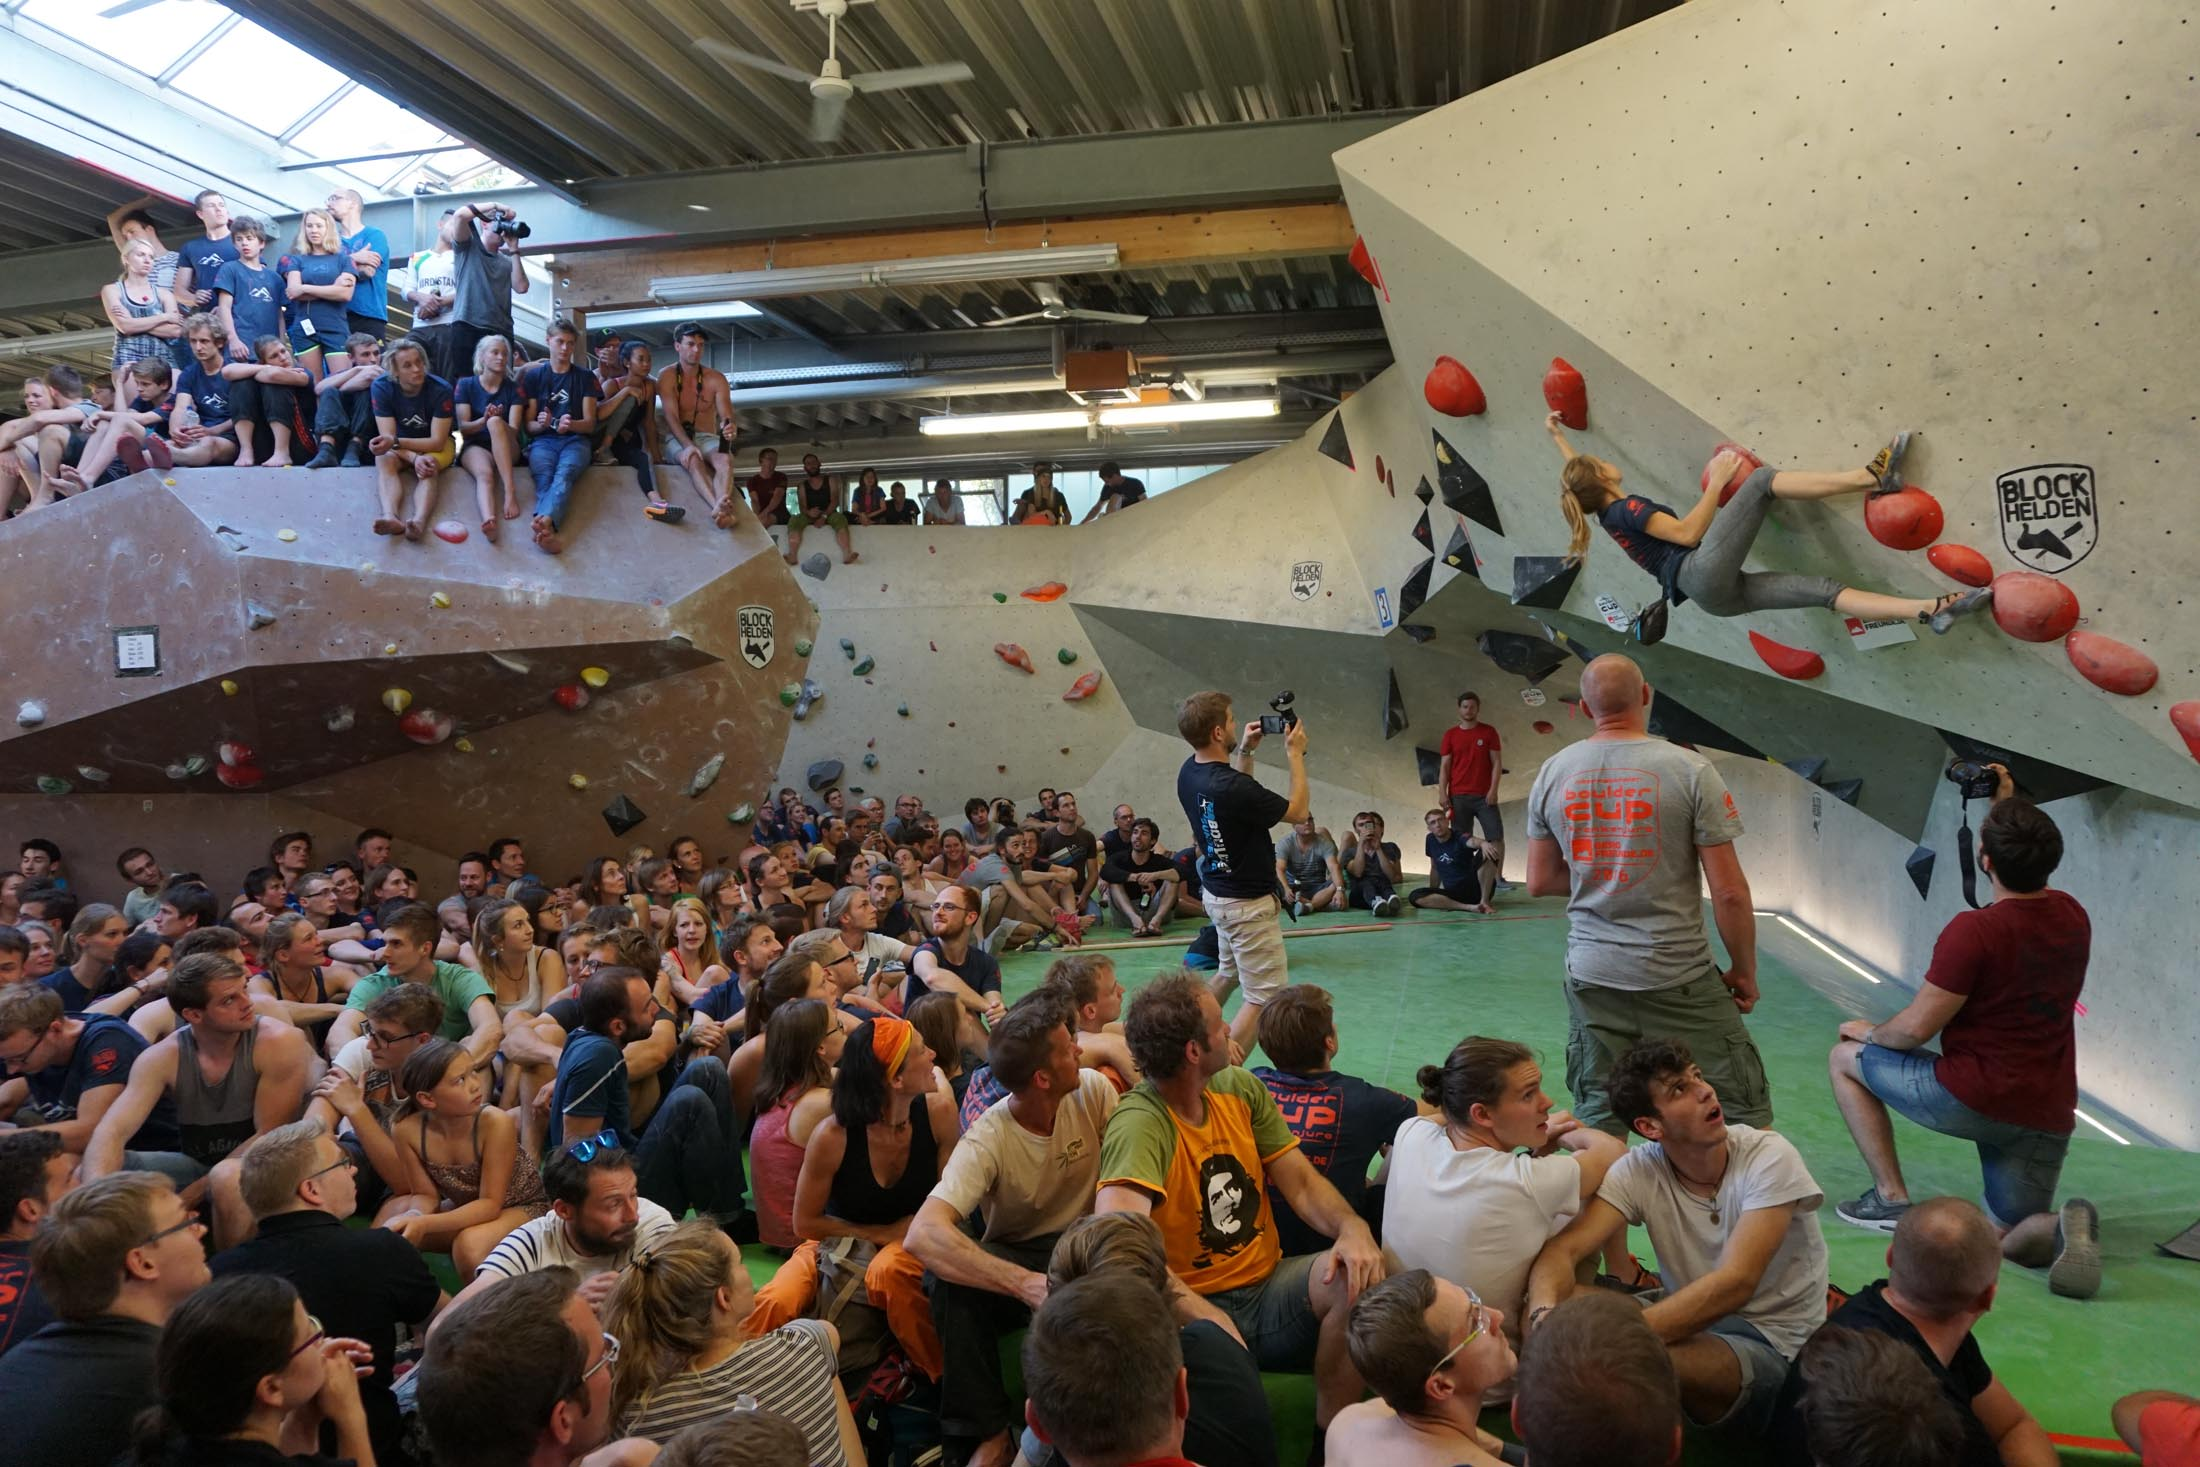 Finale, internationaler bouldercup Frankenjura 2016, BLOCKHELDEN Erlangen, Mammut, Bergfreunde.de, Boulderwettkampf07092016640